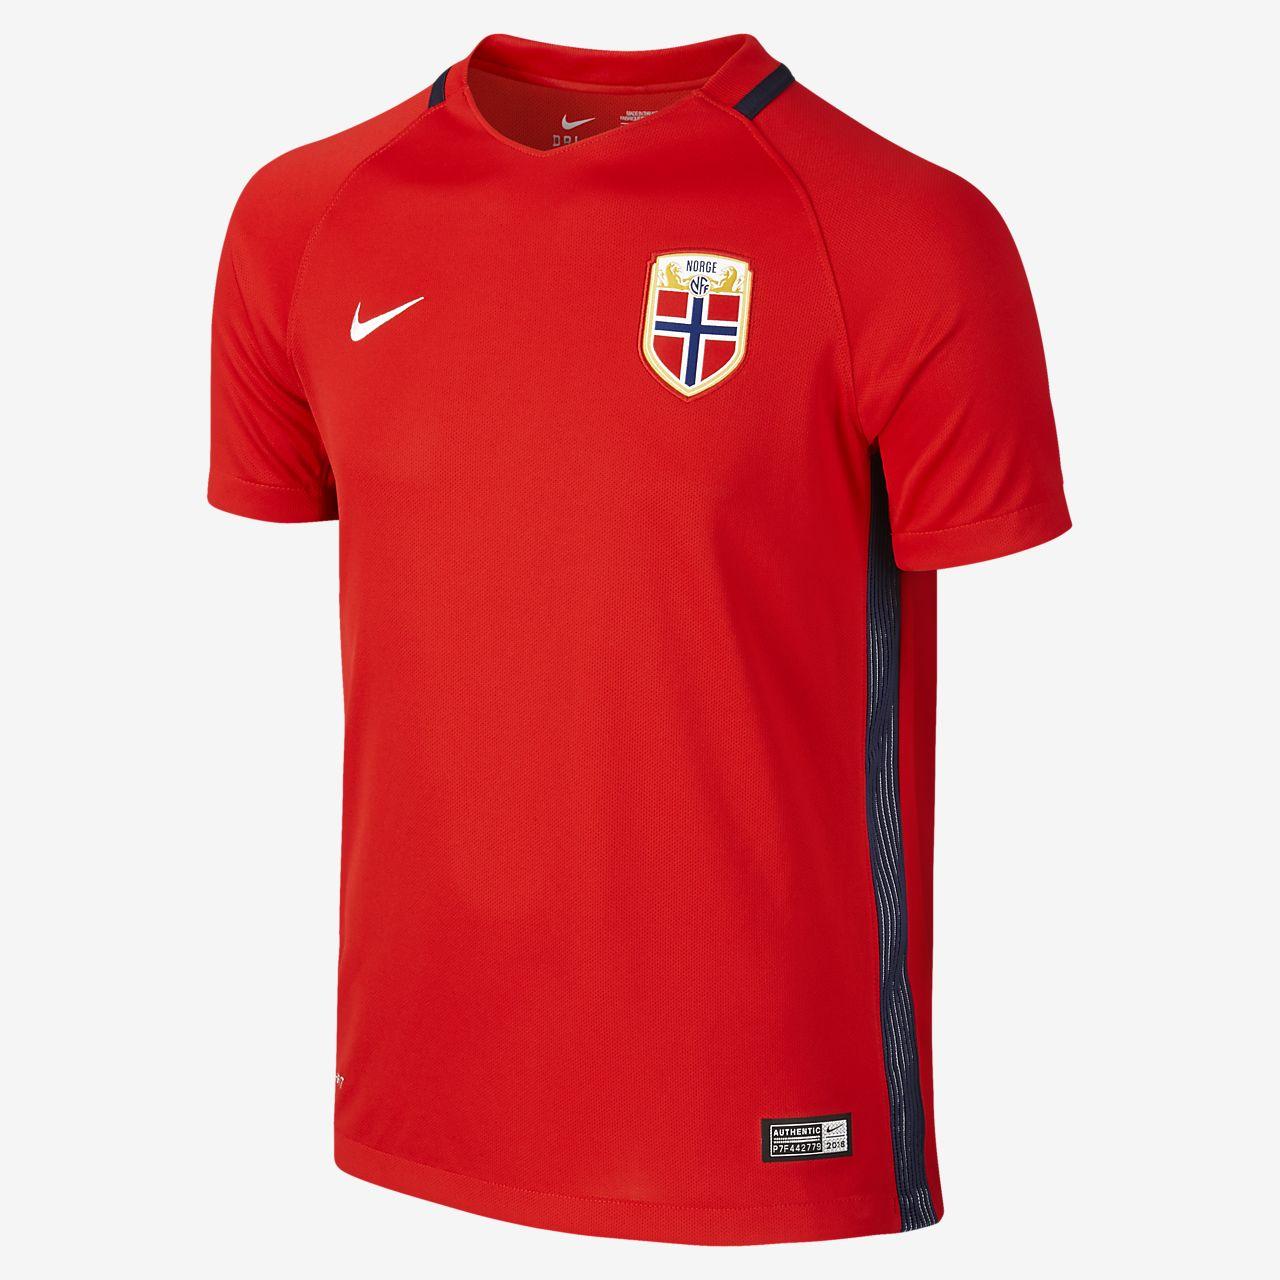 2016 Norway Stadium Home Camiseta de fútbol (XS-XL) - Niño/a